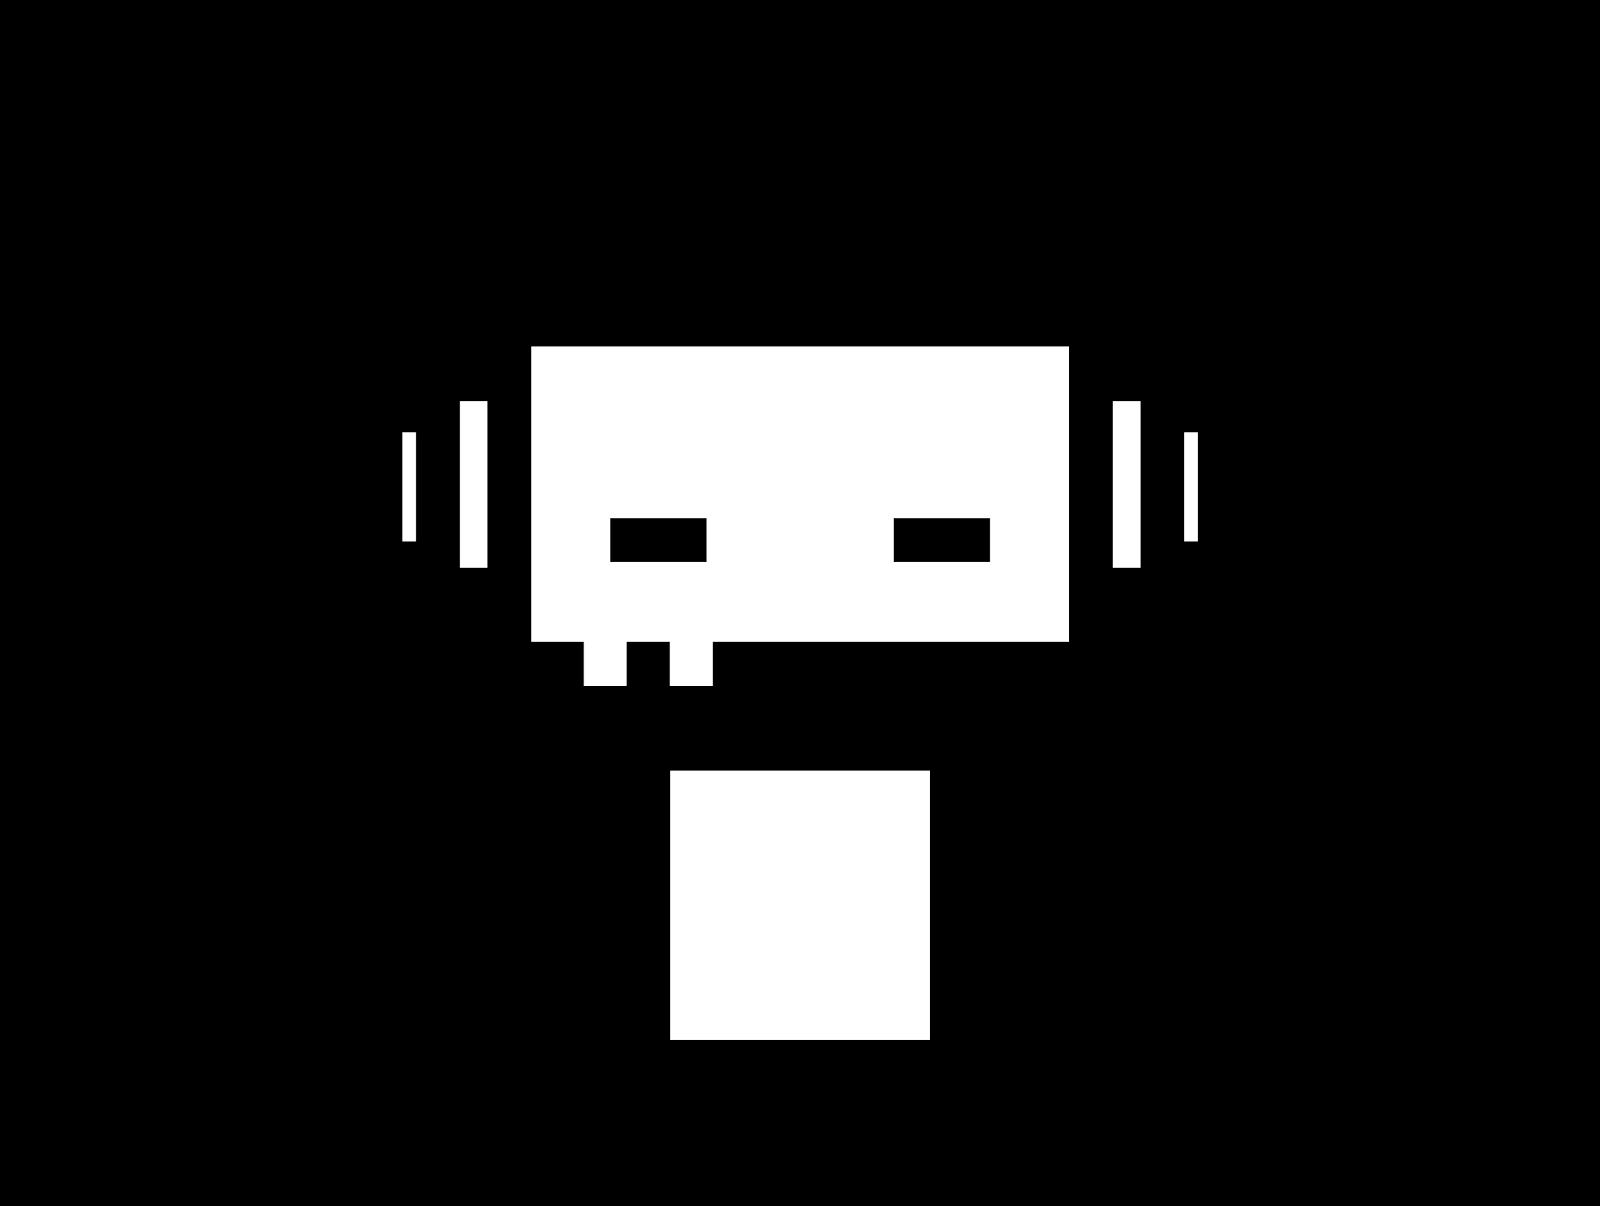 robotfranciscos blog robot ambigram logo design